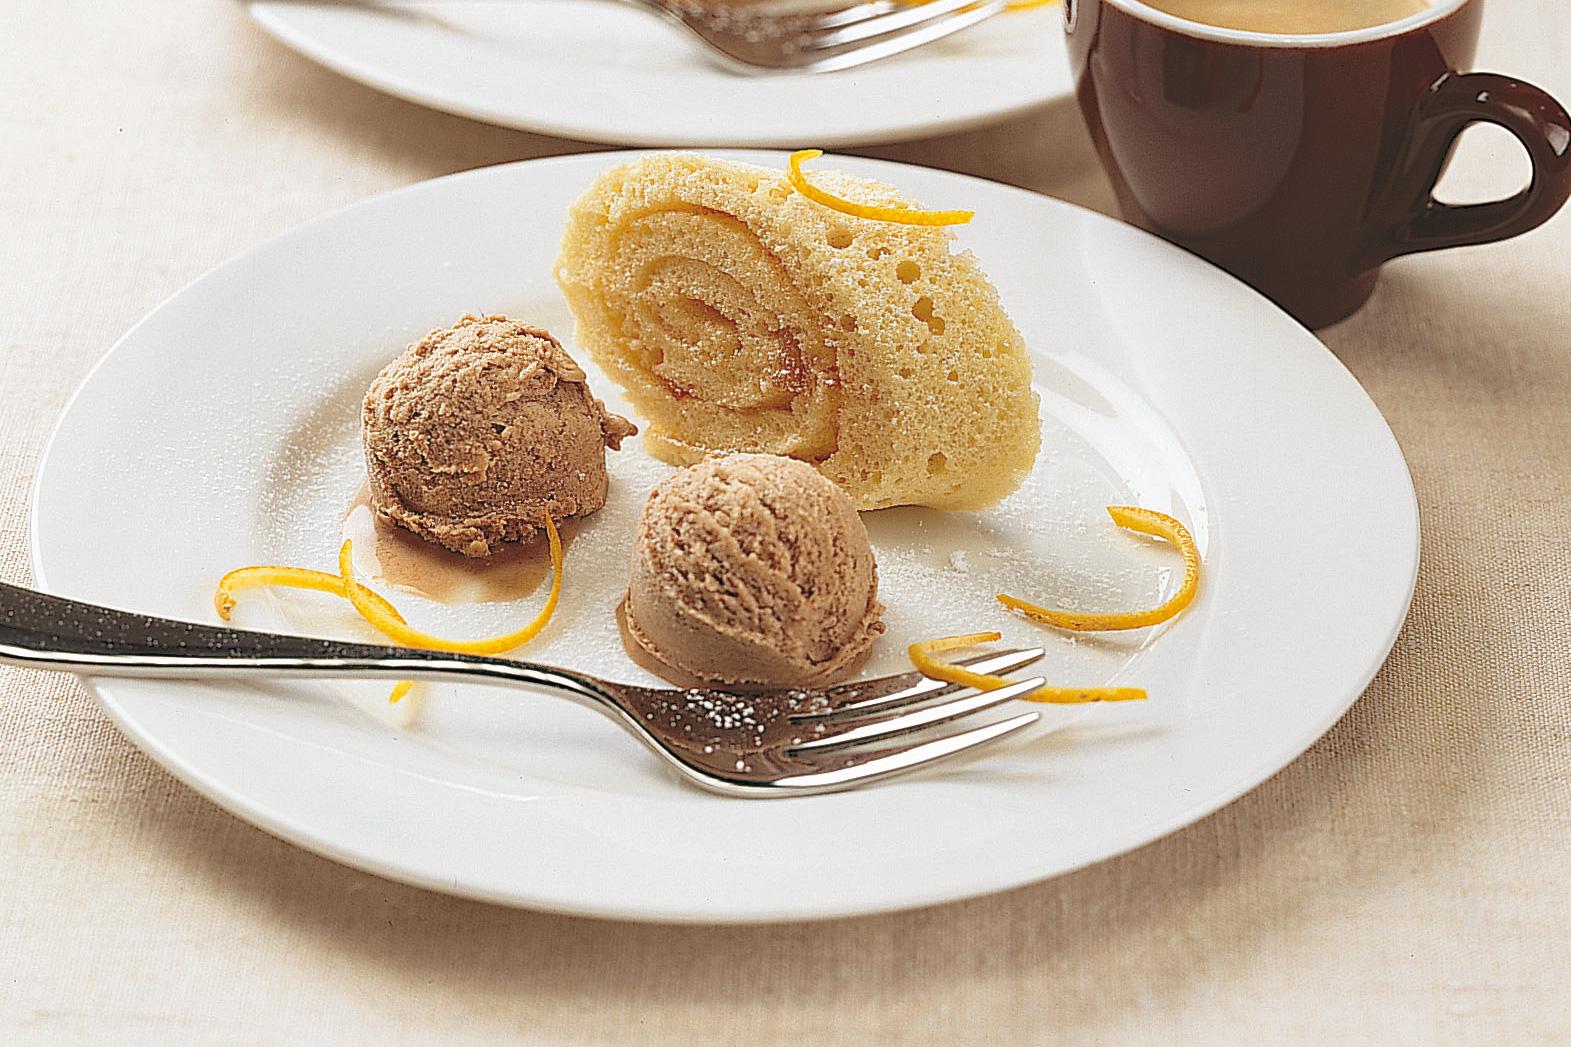 Biskuitroulade mit Espresso-Mousse